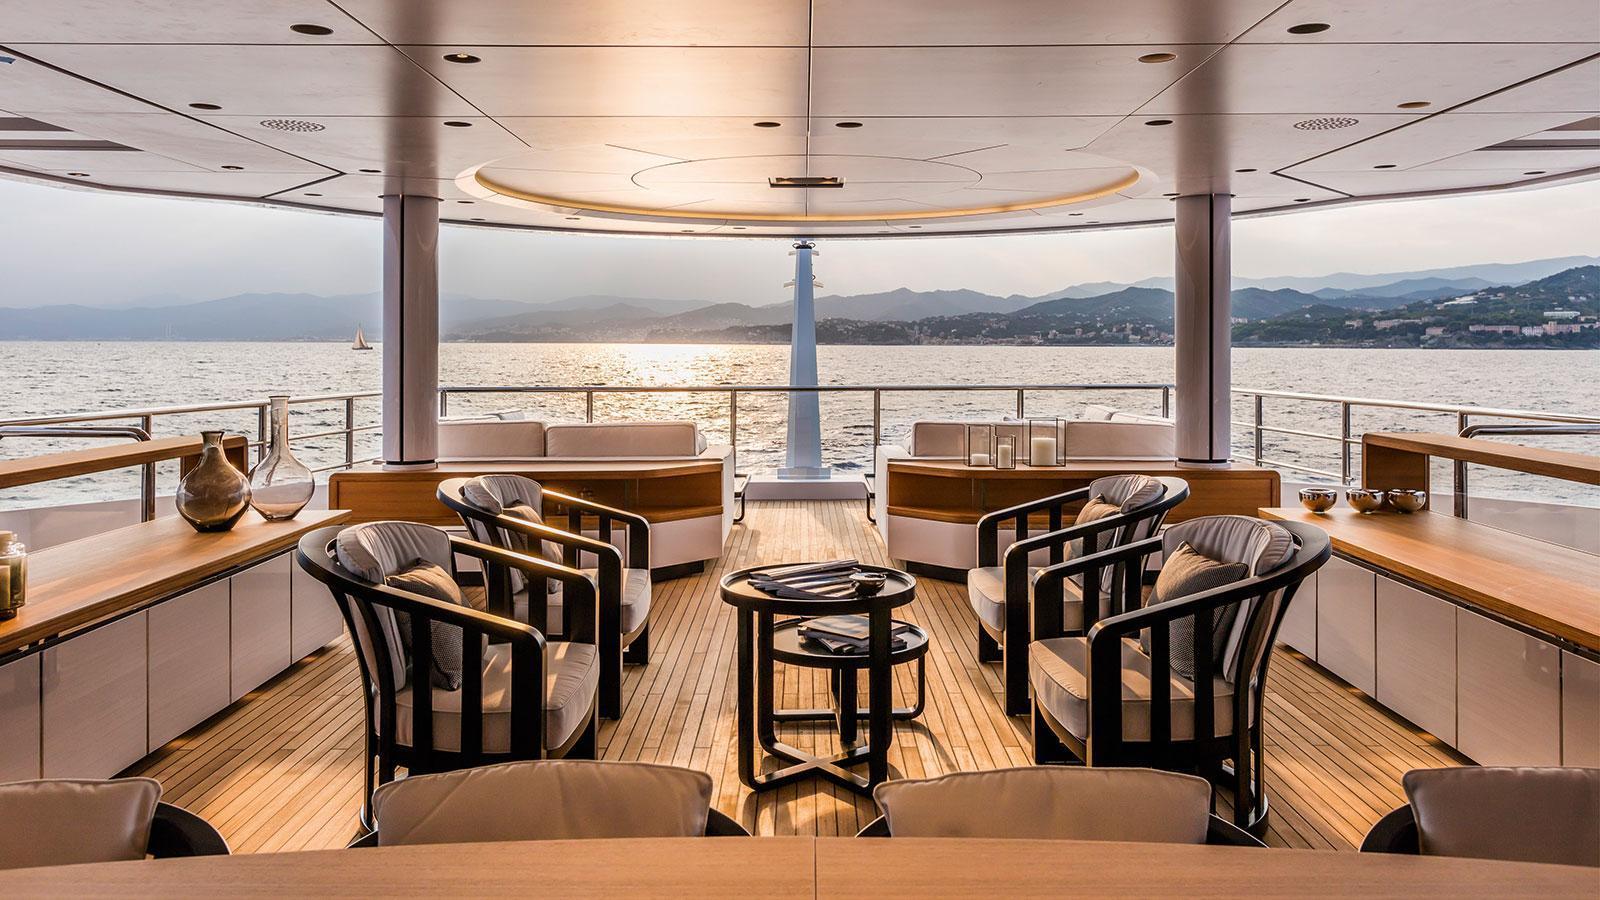 suerte-motor-yacht-tankoa-2015-69m-upper-deck